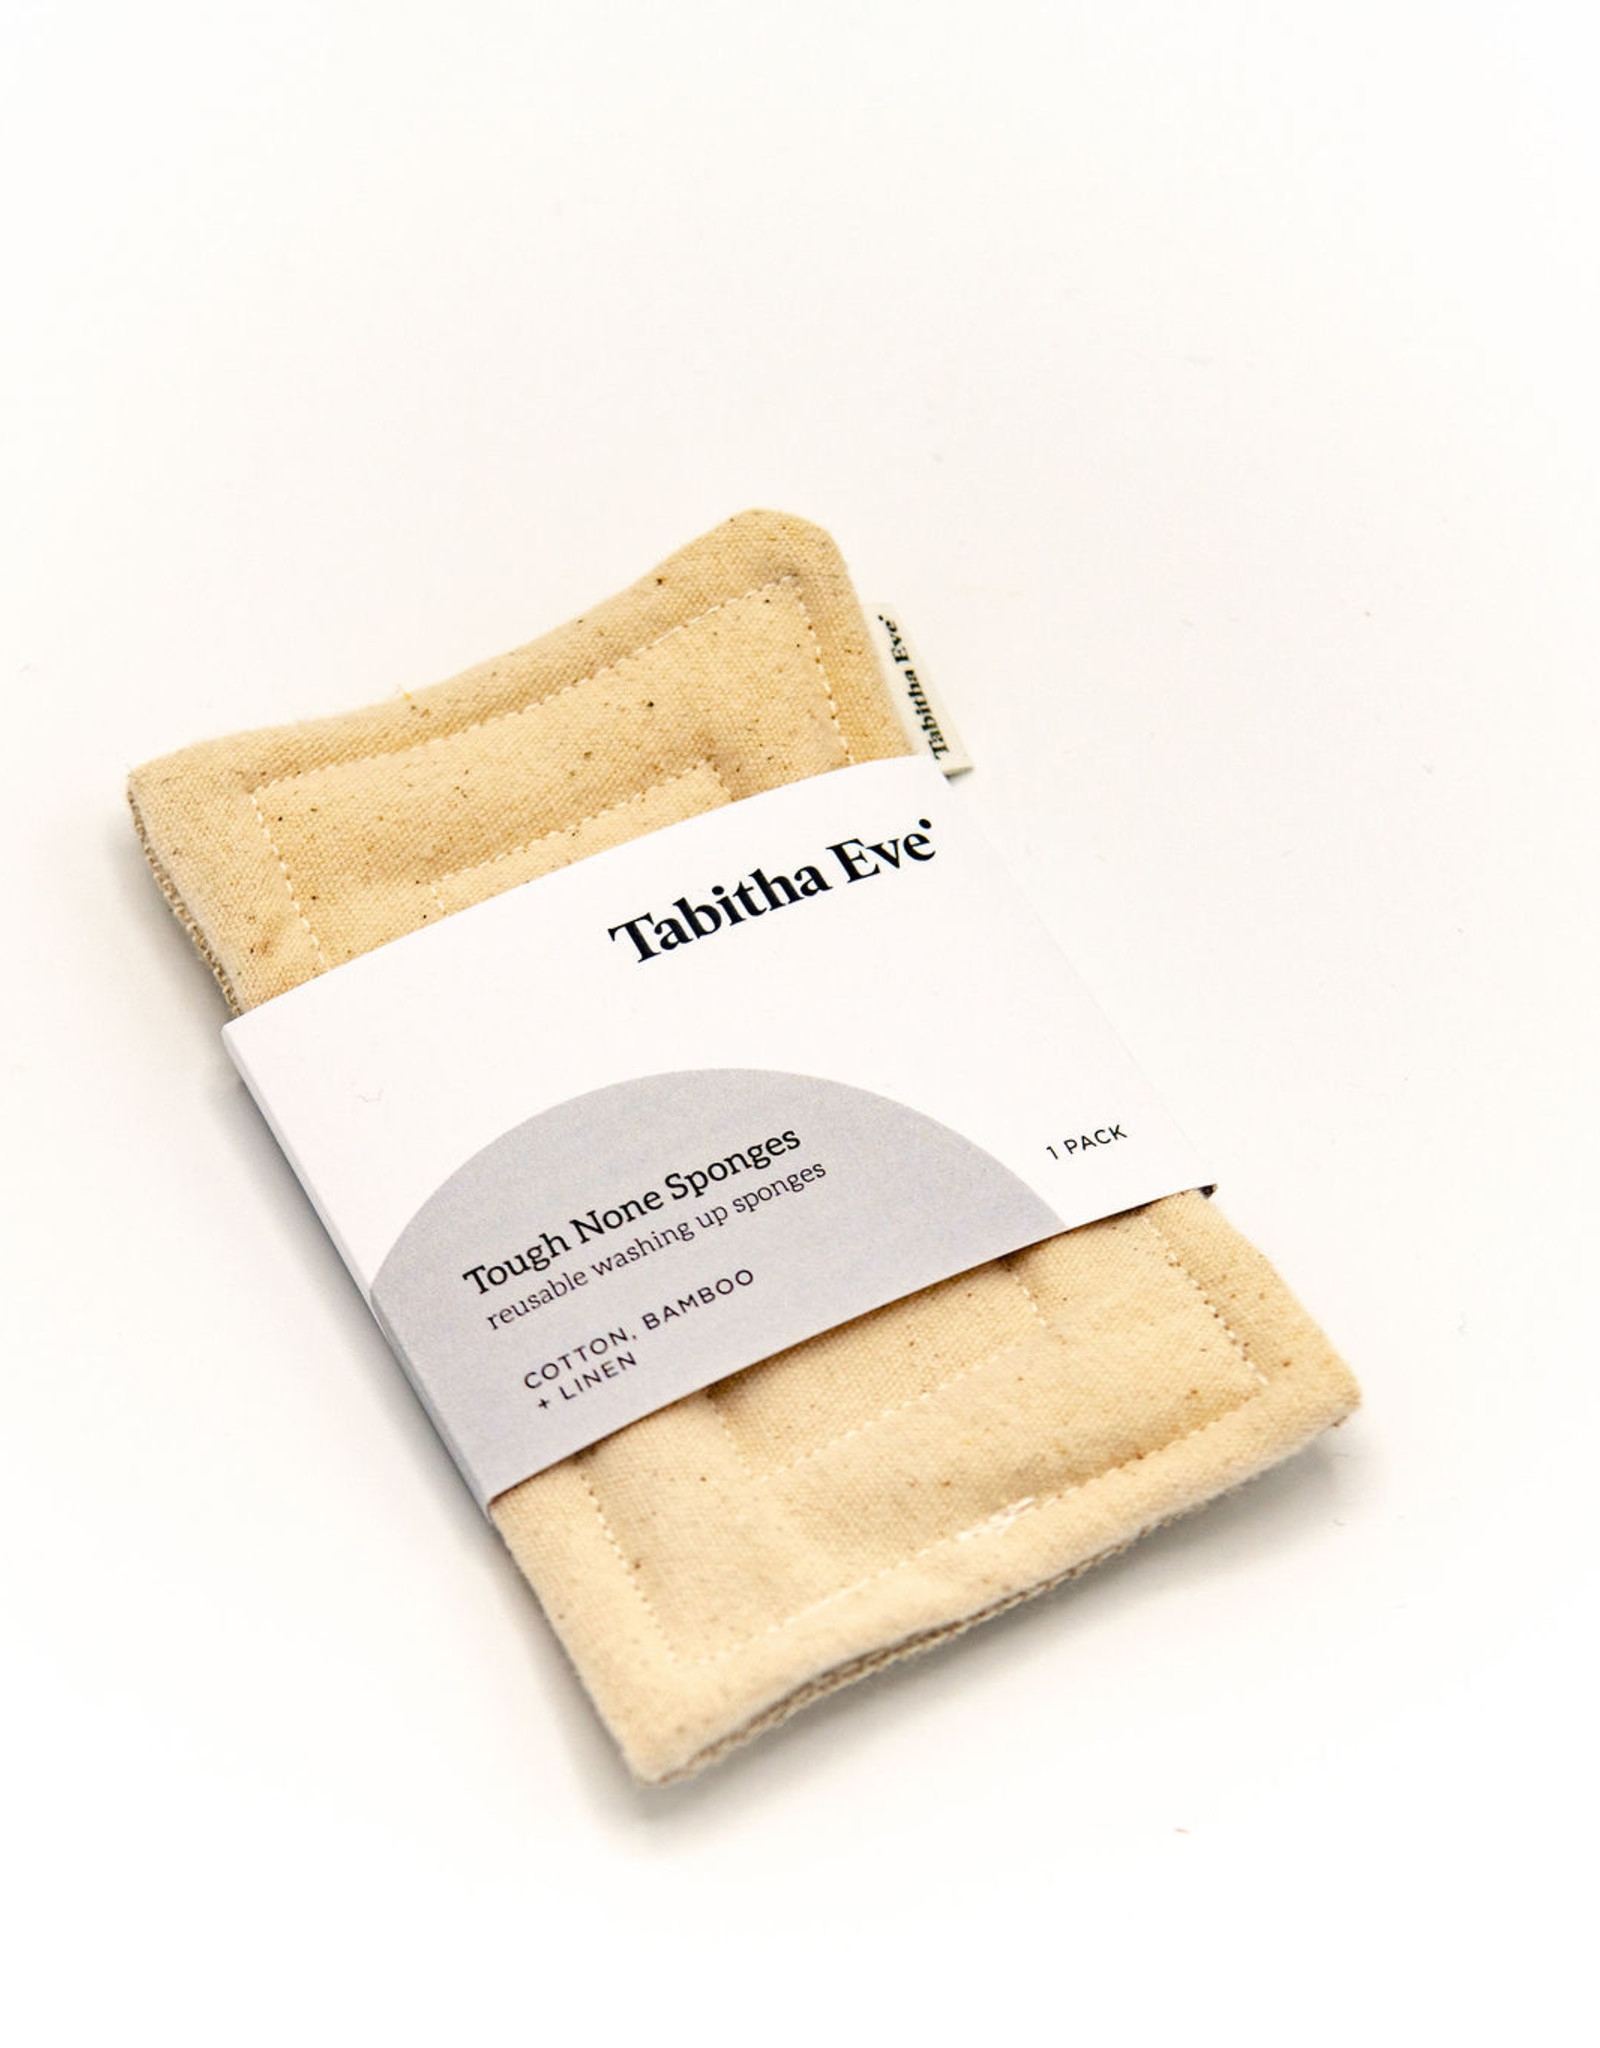 Tabitha Eve Tough none sponges